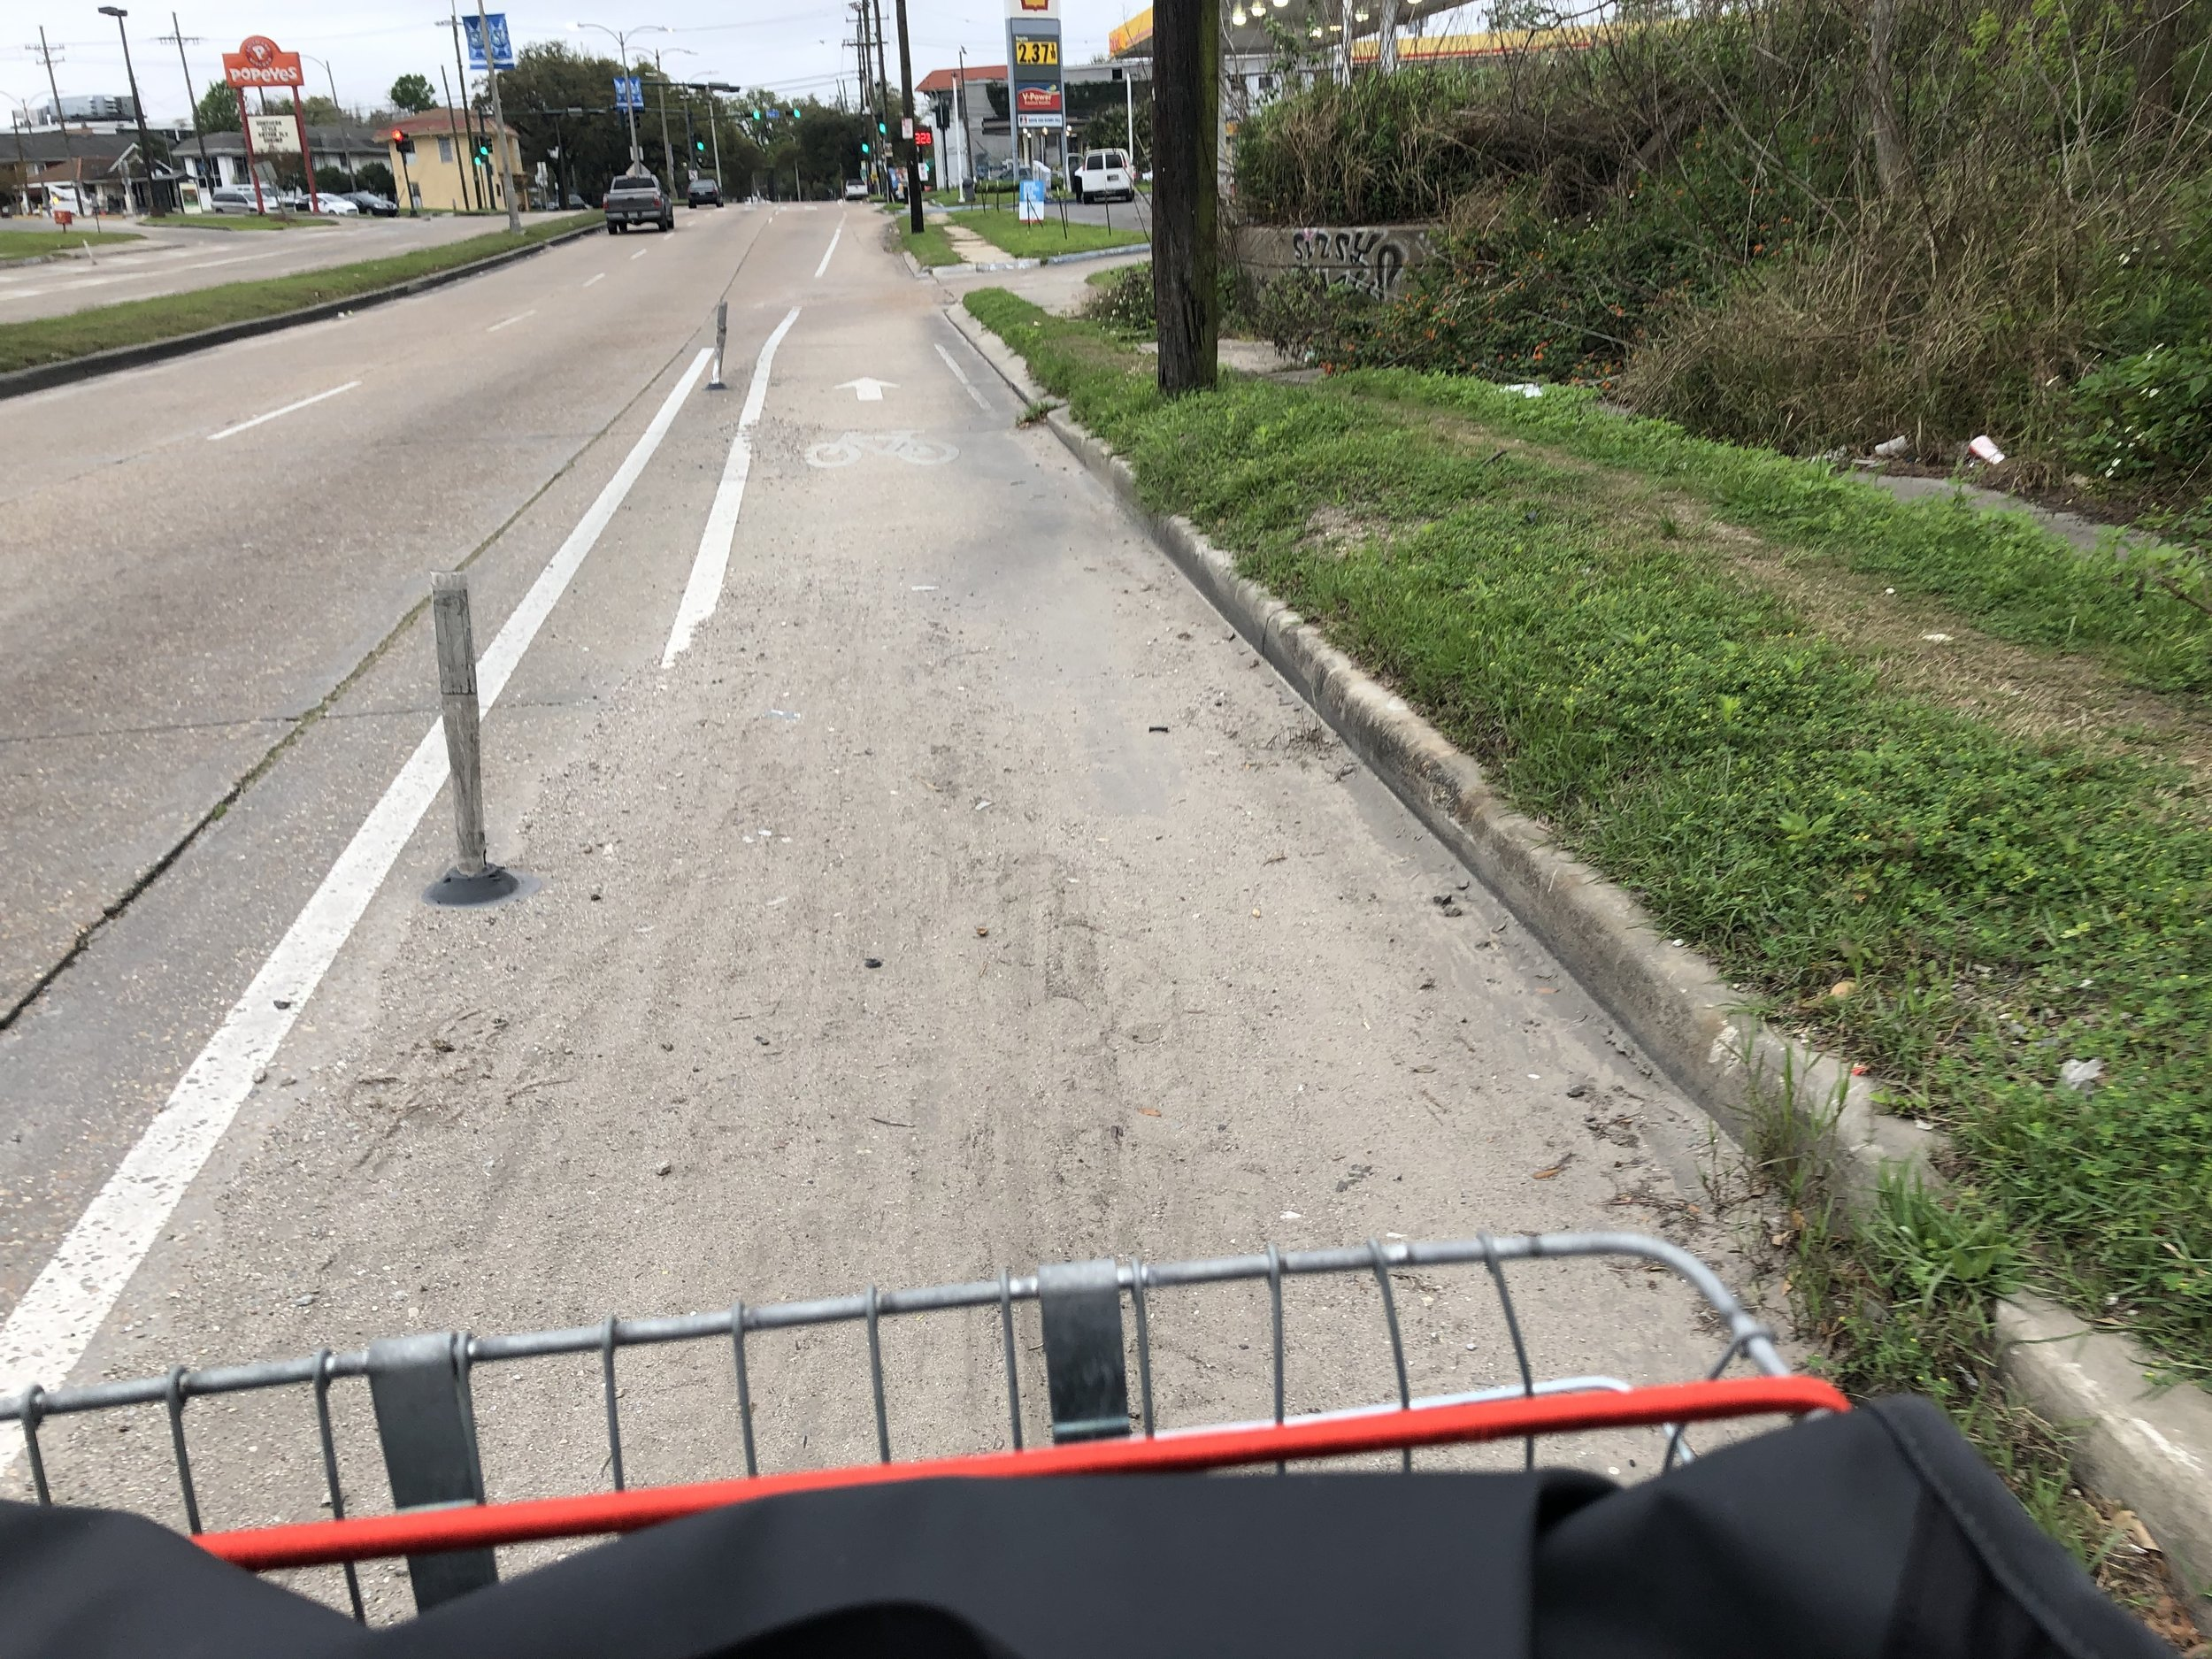 Bike Lane on Gentilly Blvd.